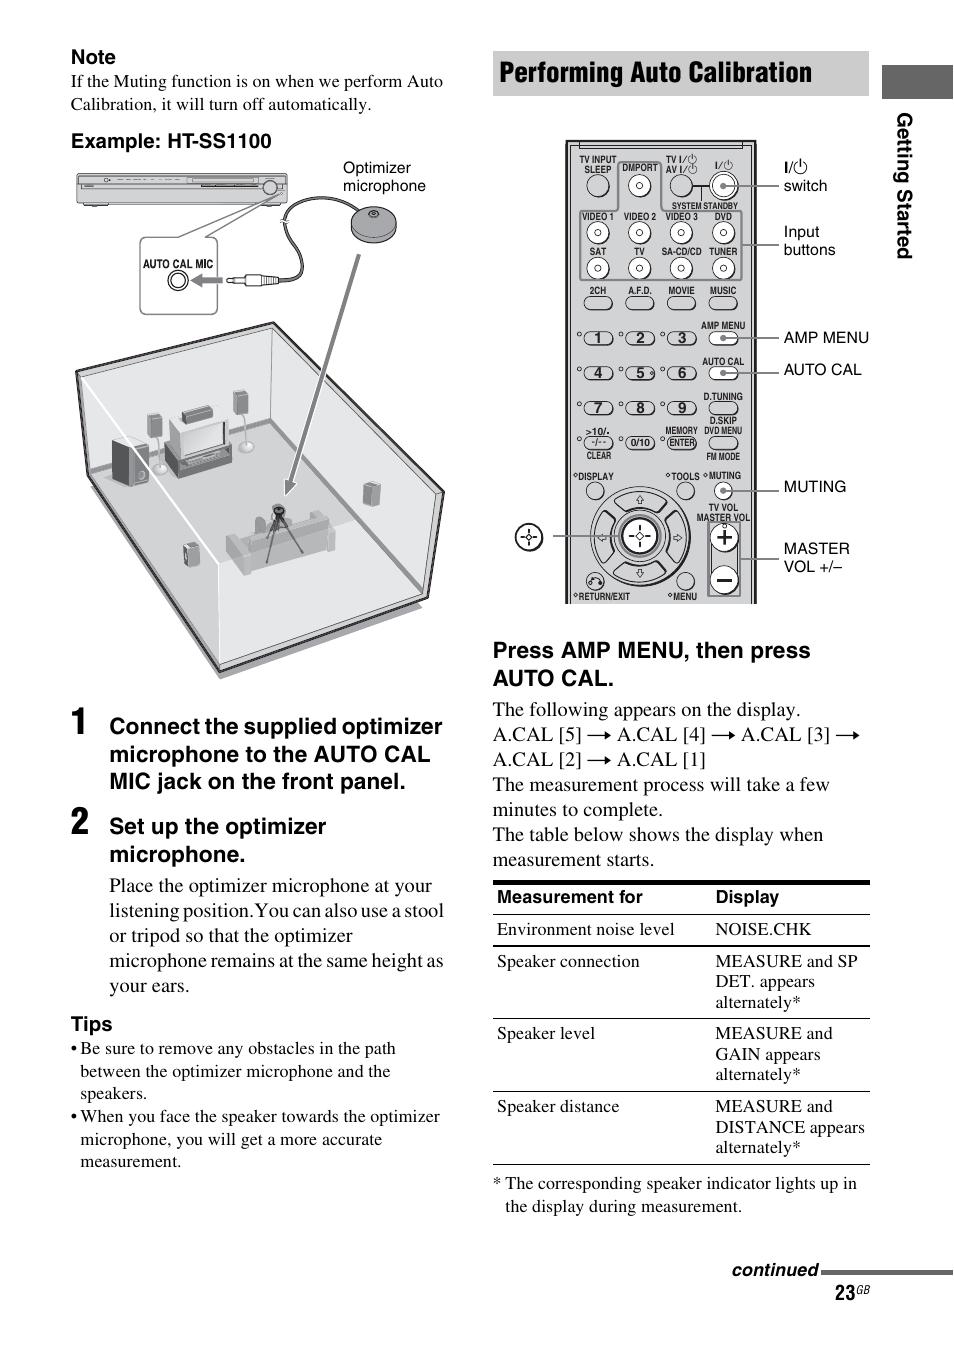 Performing auto calibration, Set up the optimizer microphone, Press amp  menu, then press